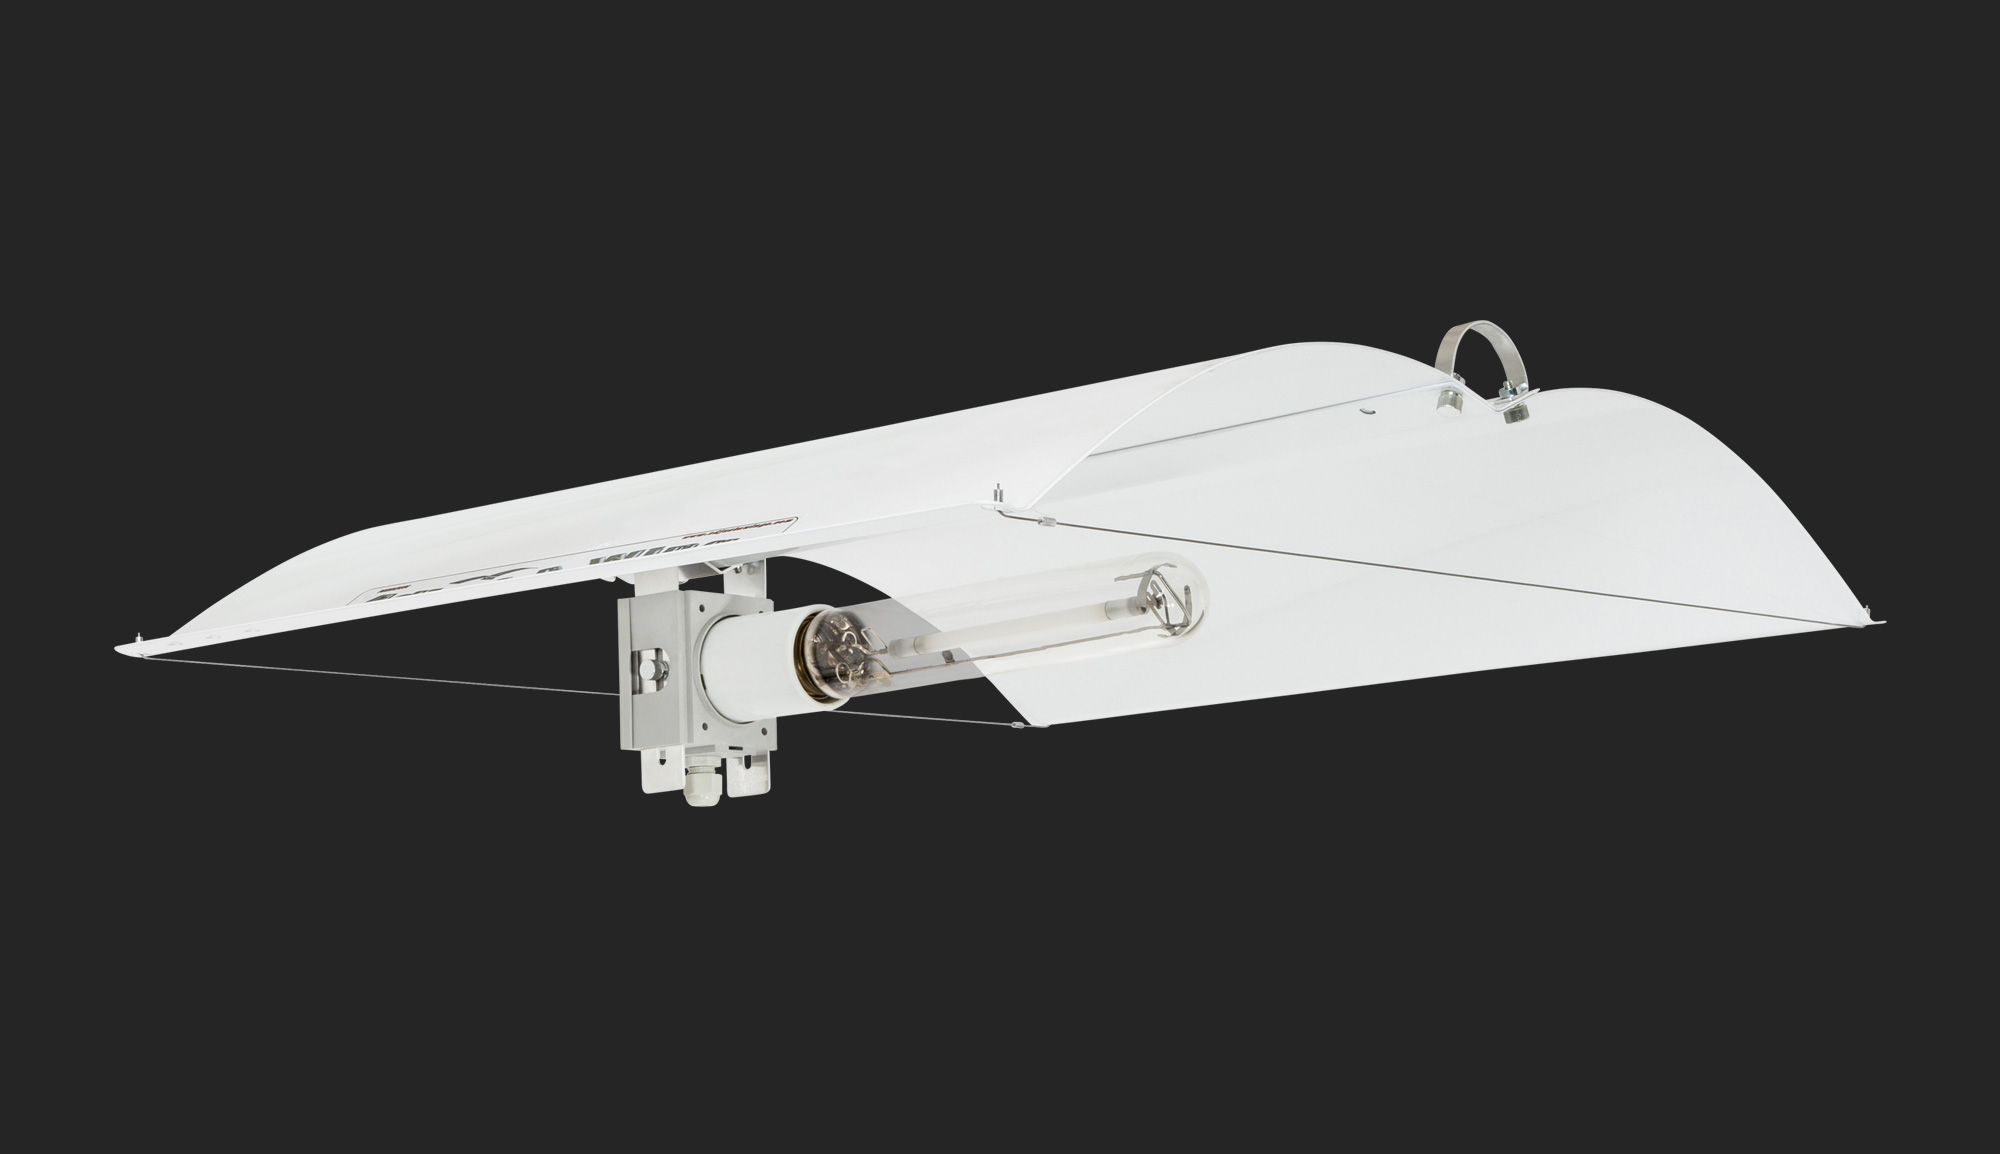 Defender Medium Reflector - Adjust-A-Wings